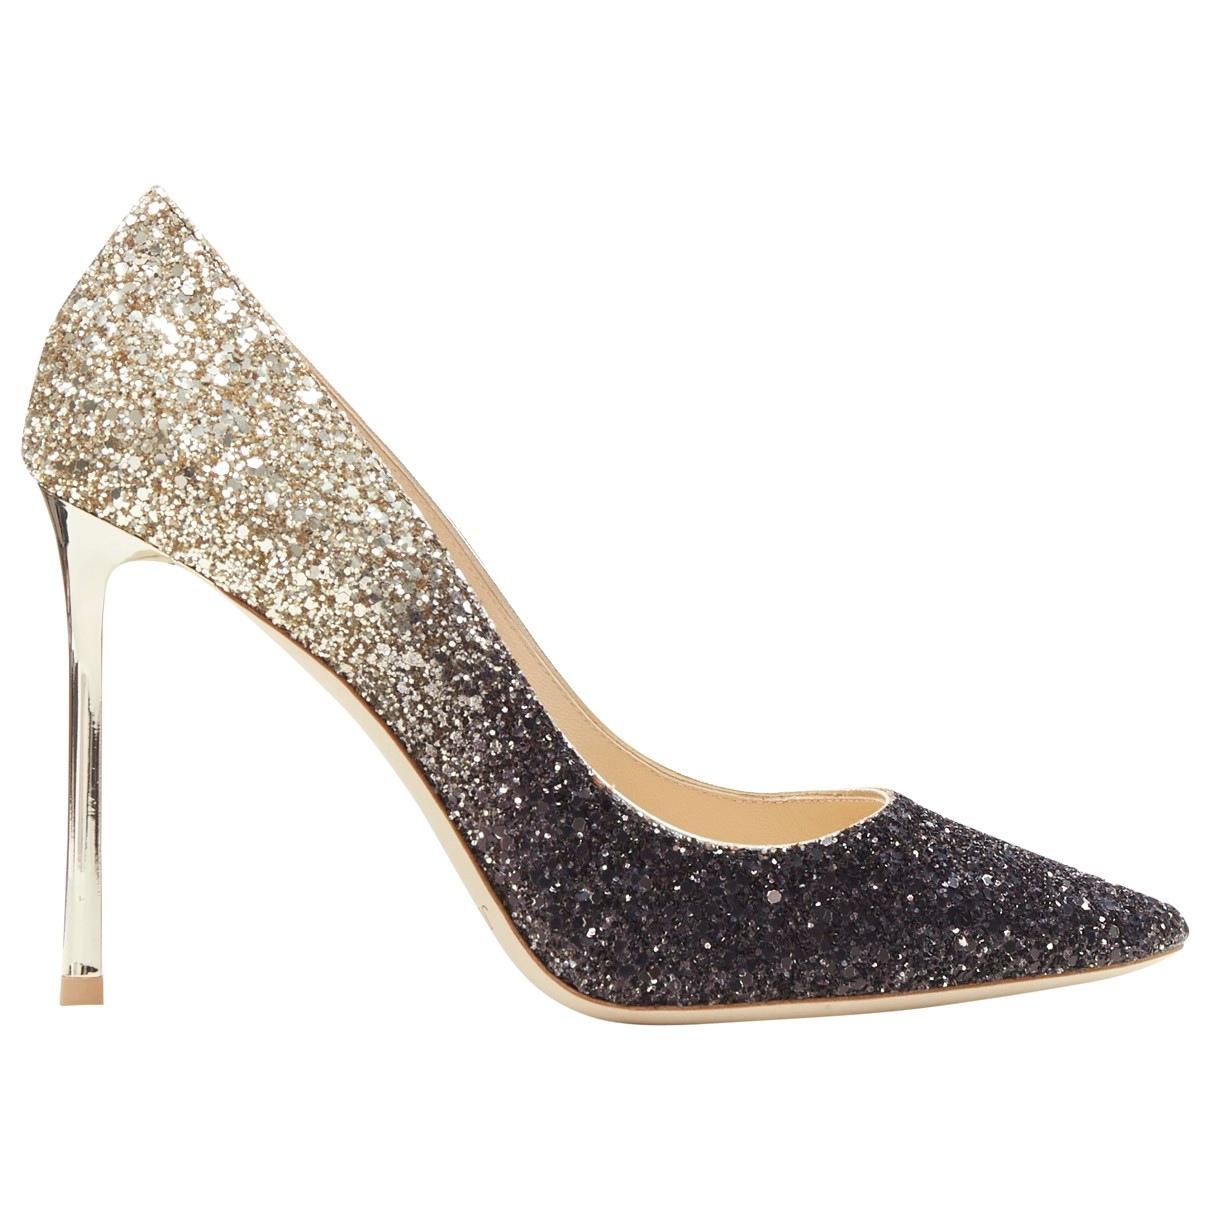 Jimmy Choo Romy Gold Glitter Heels for Women 37.5 EU